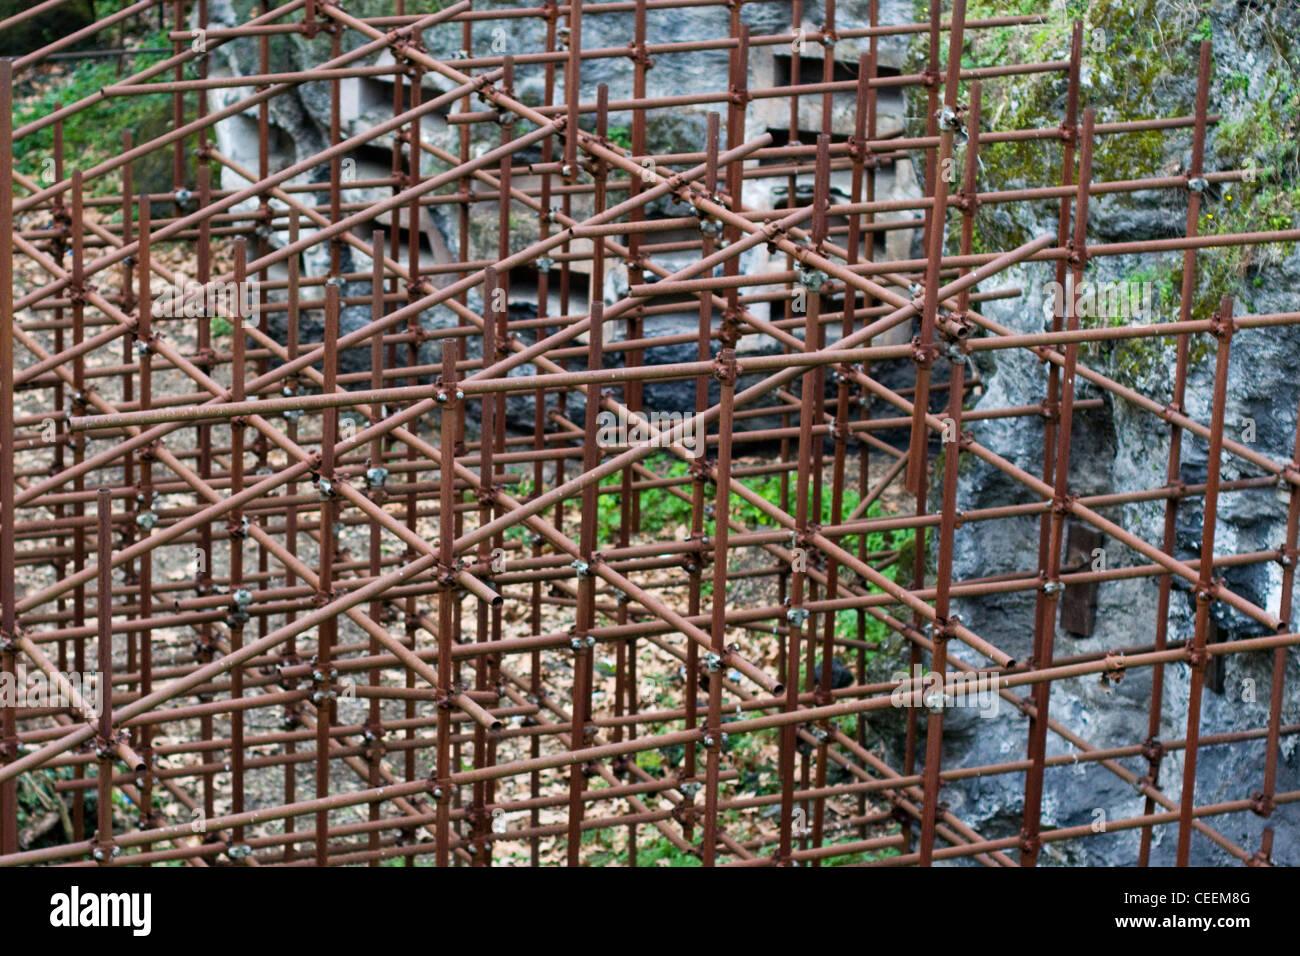 Scaffolding in Pompeii Italy - Stock Image